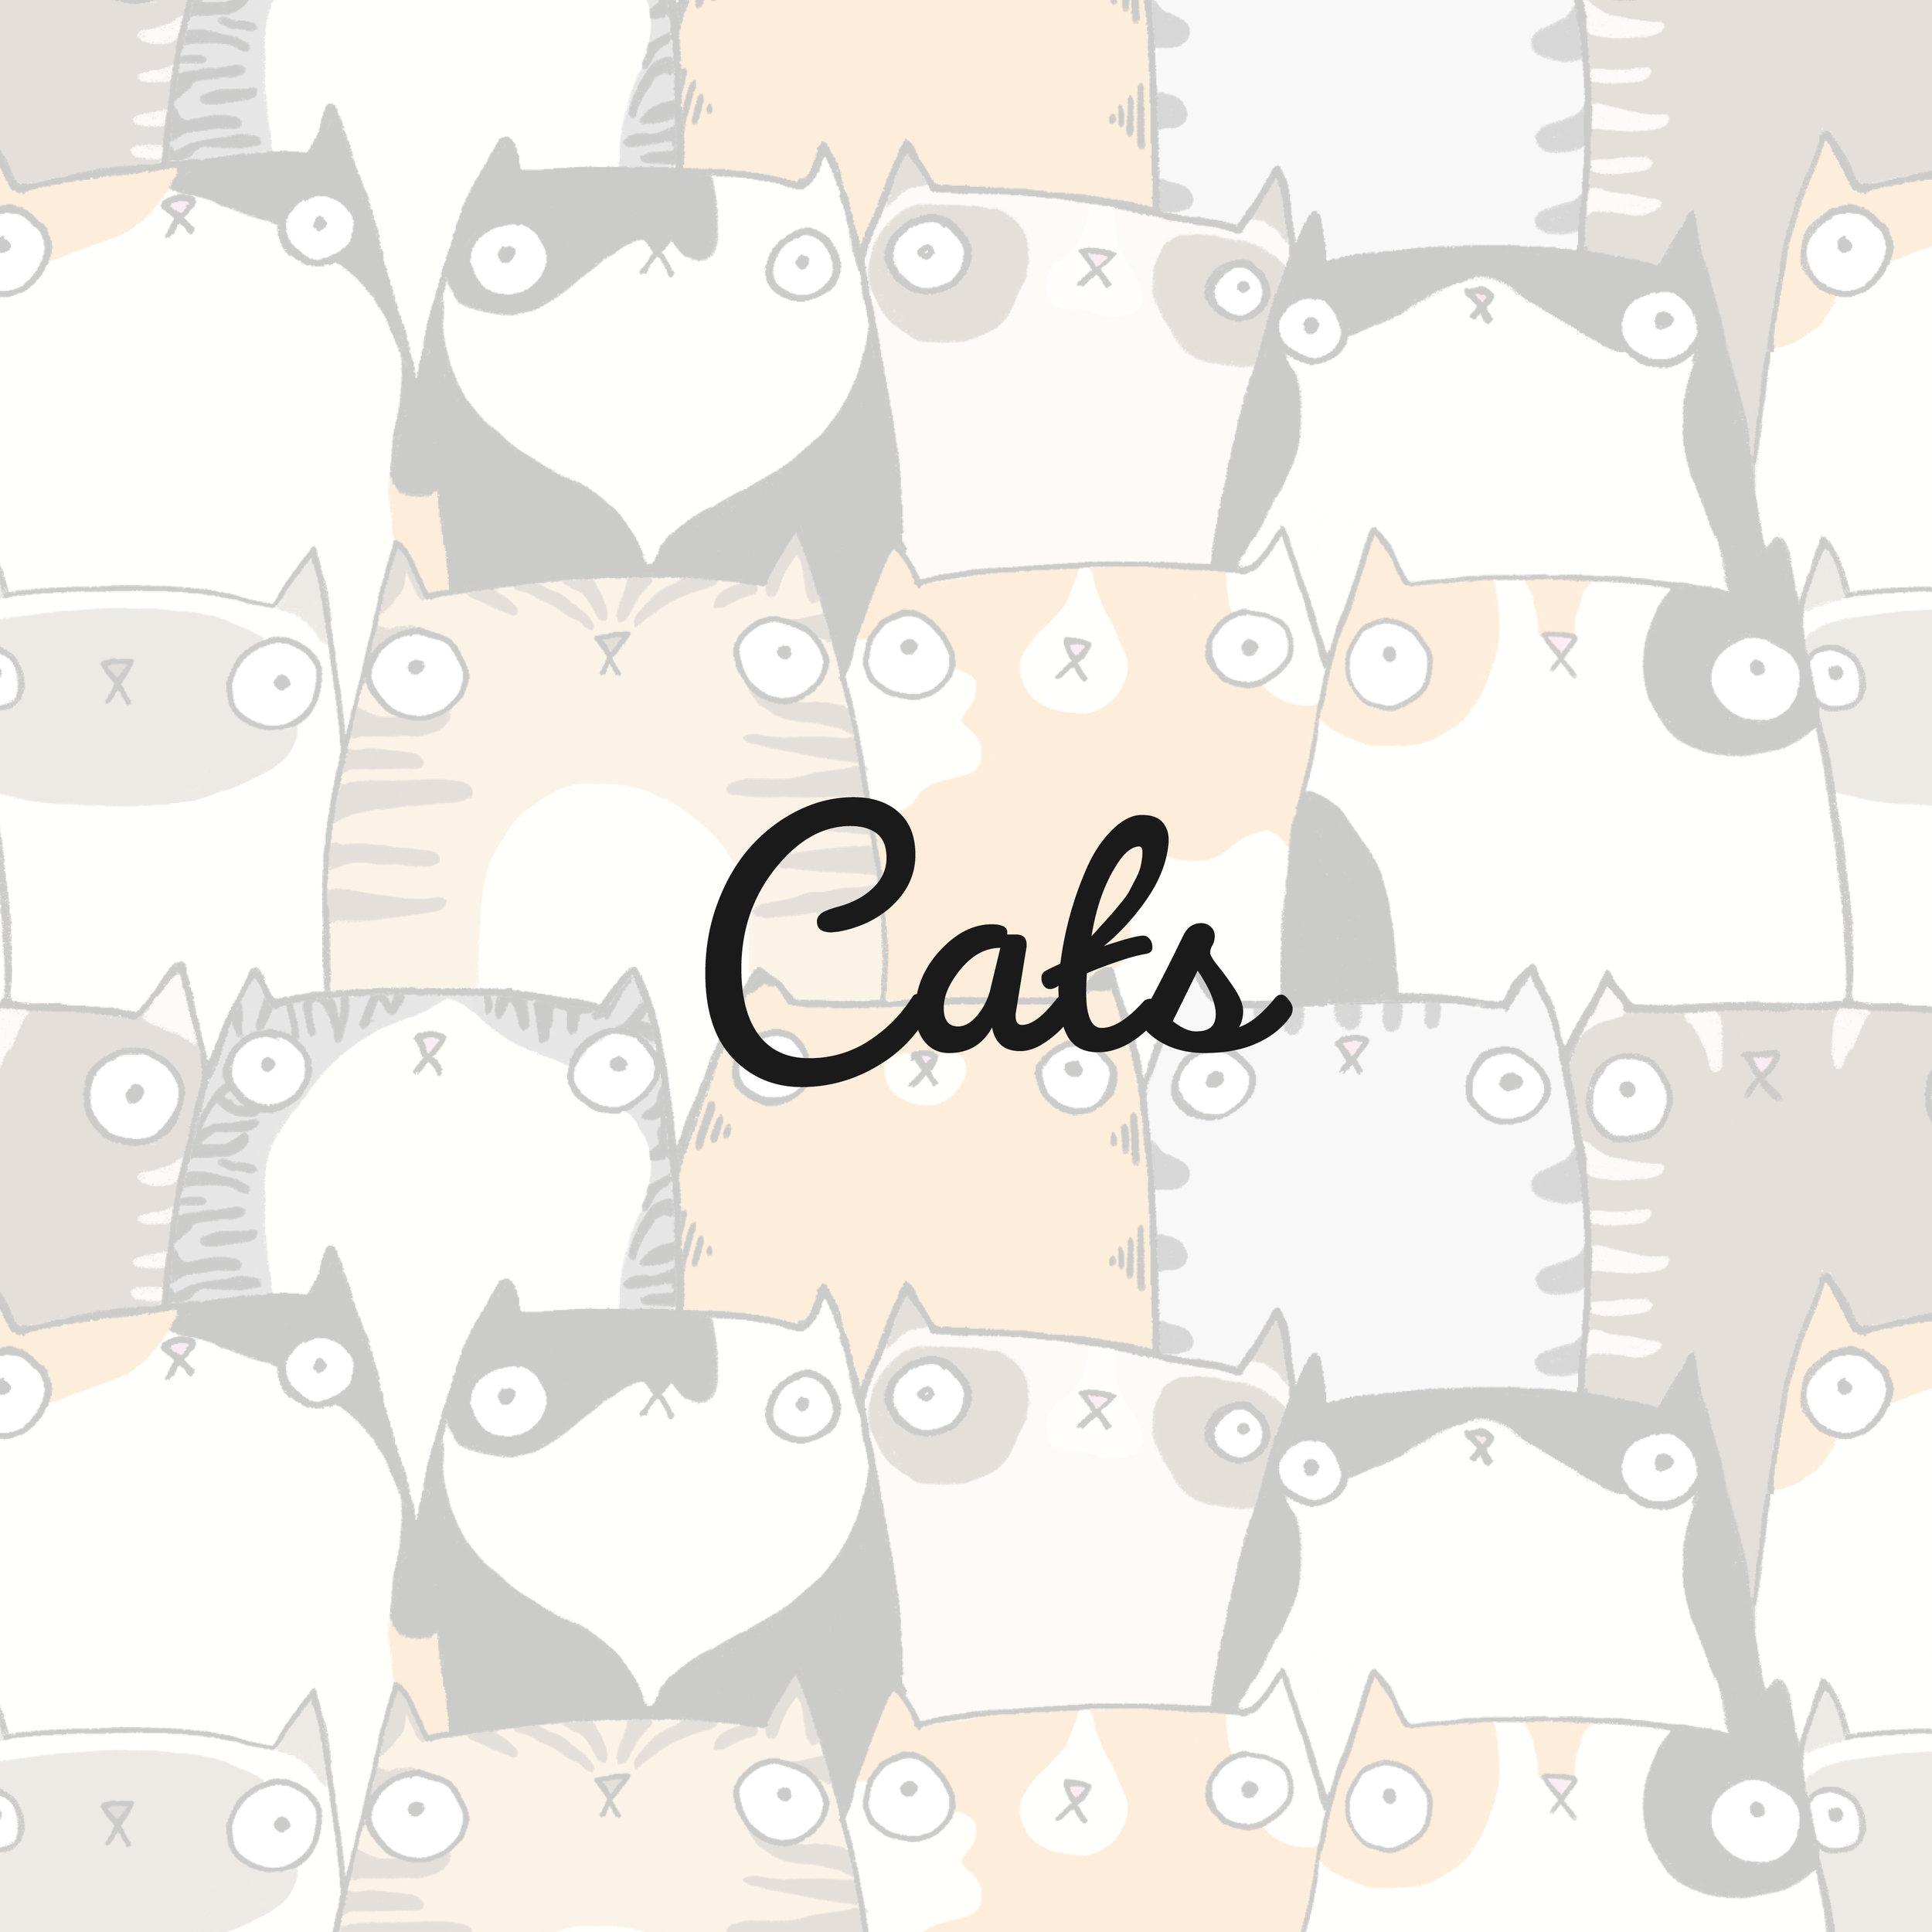 Cats_square.jpg